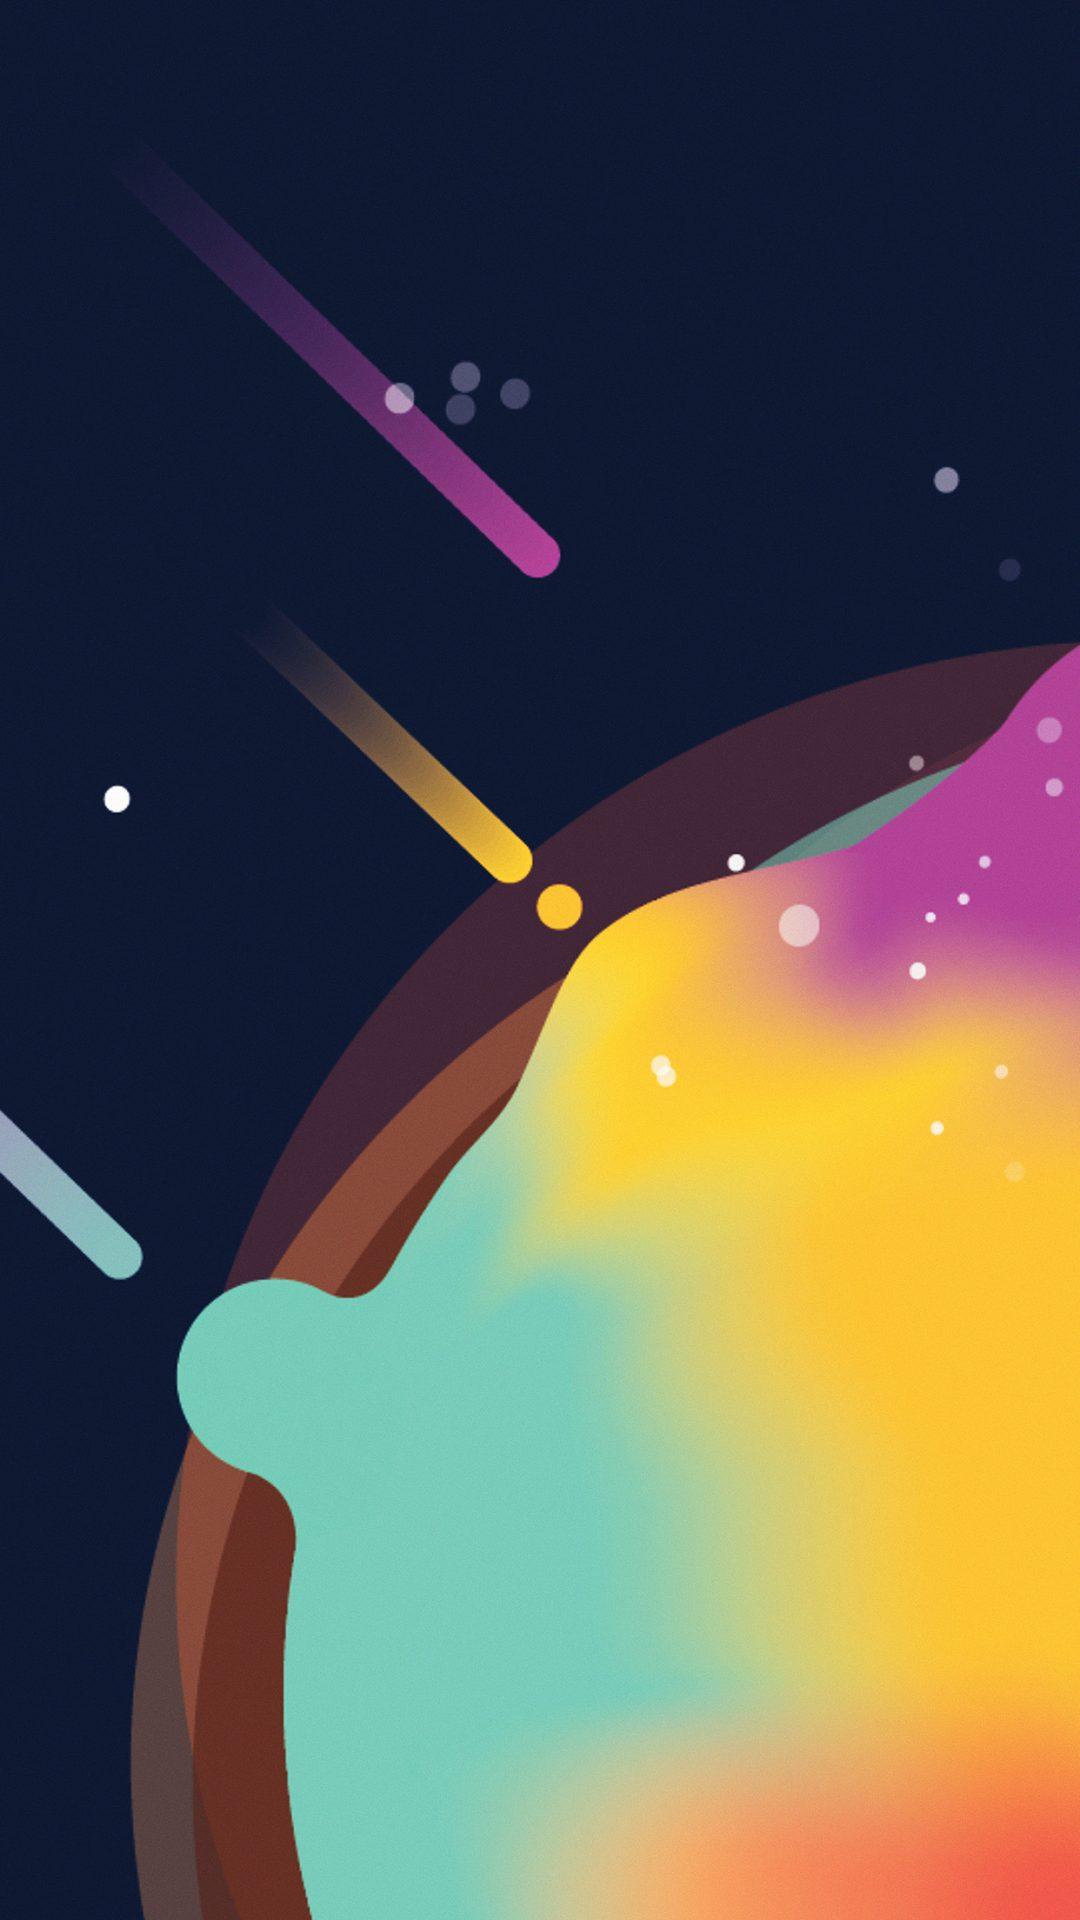 Space Simple Minimal Graphic Illustration Art